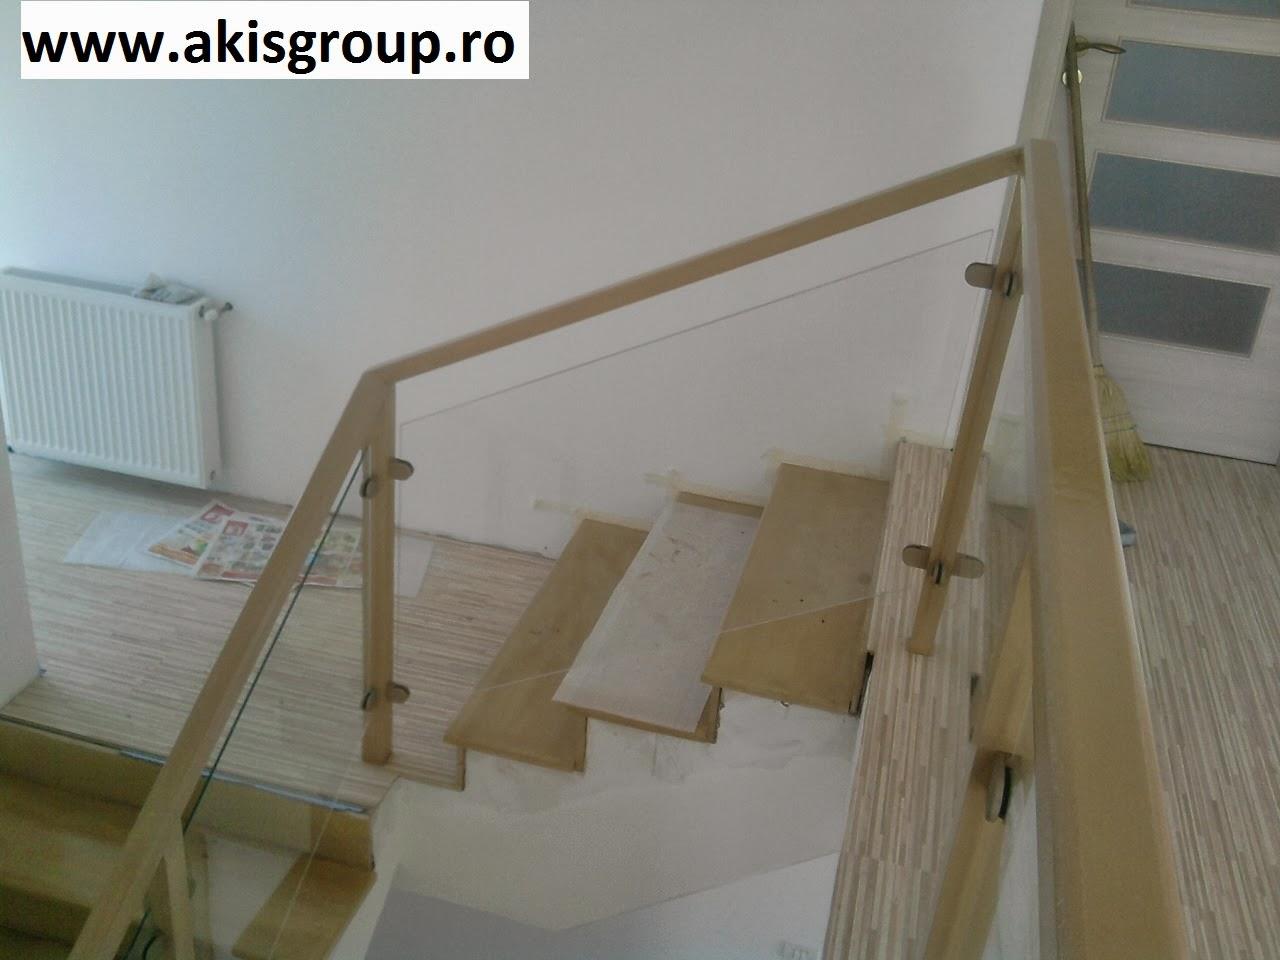 treppengel nder innen holz und glas. Black Bedroom Furniture Sets. Home Design Ideas